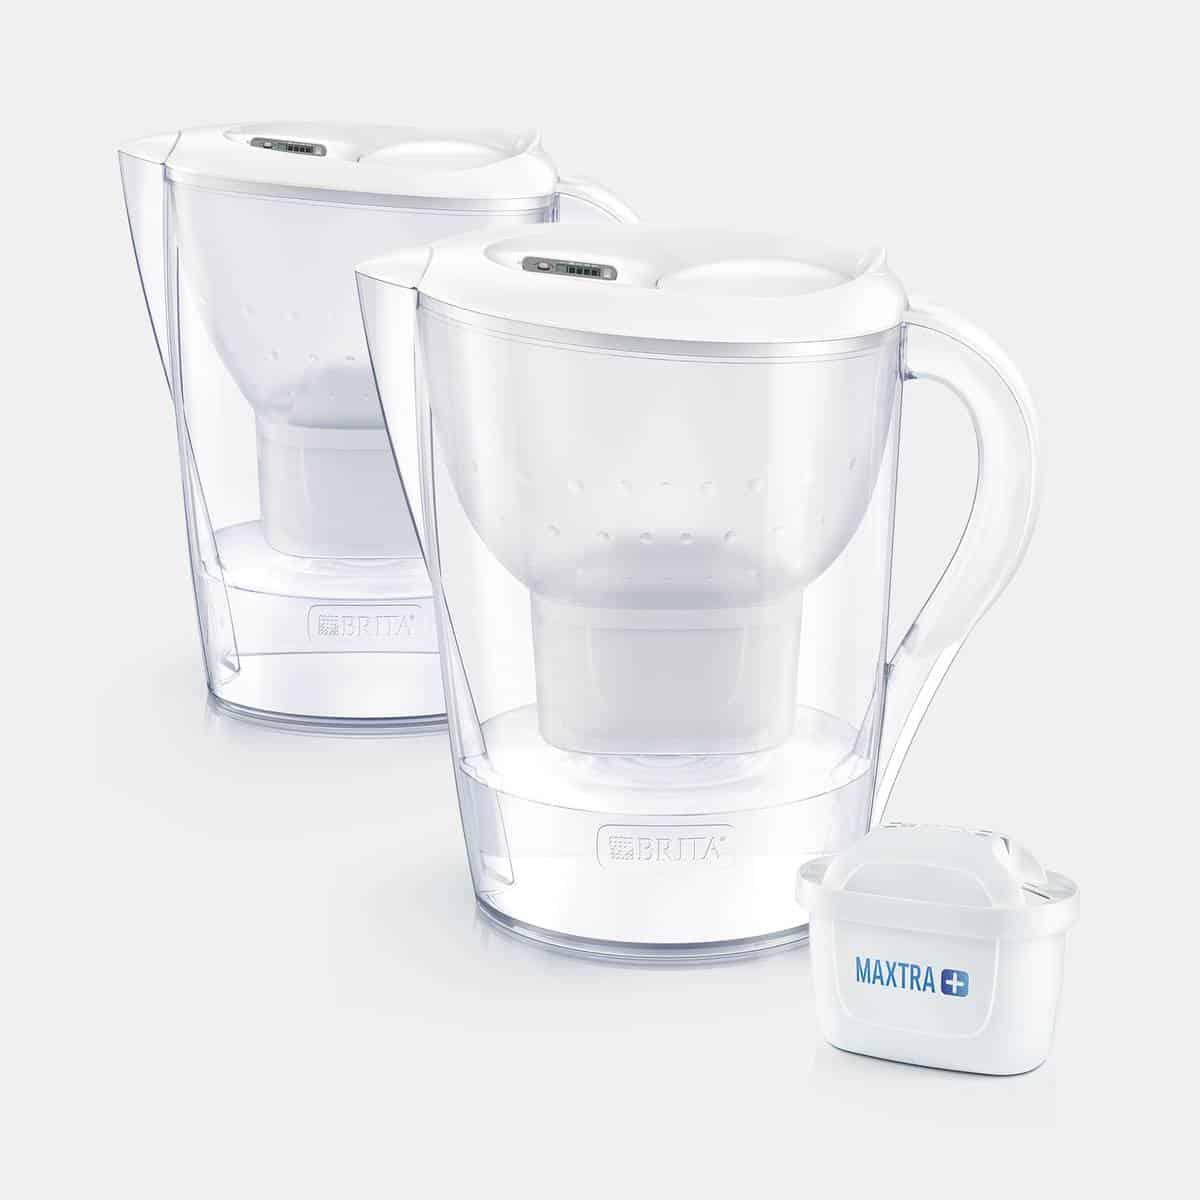 BRITA Marella Memo White Water Filter Jugs